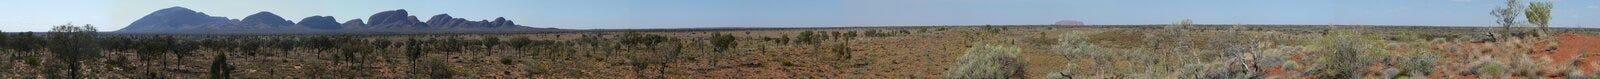 Kata Tjuta (Olgas) e panorama di Uluru (roccia di Ayers) Fotografia Stock